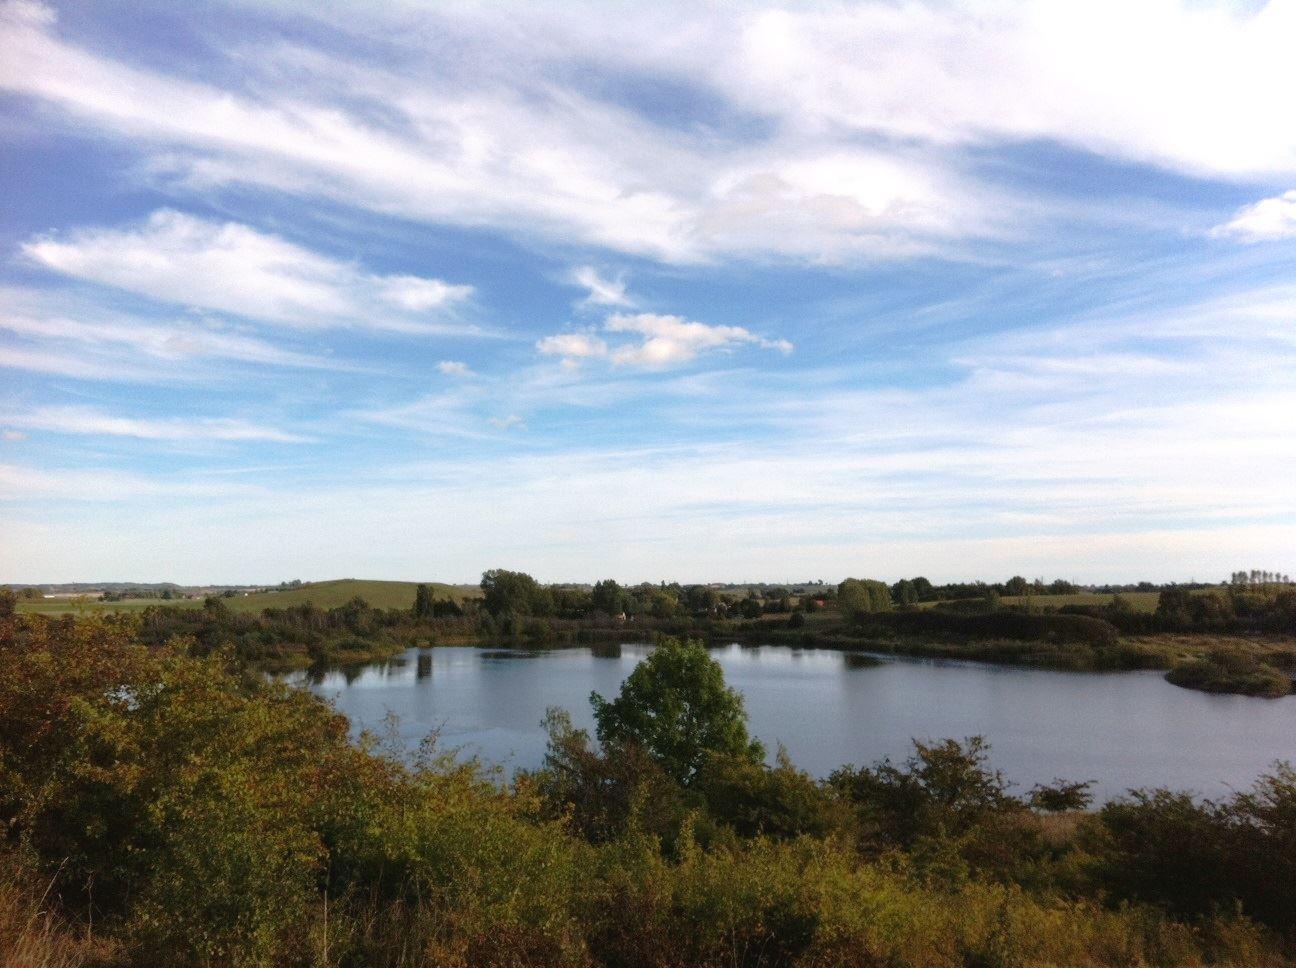 Arriesjöns strövområde